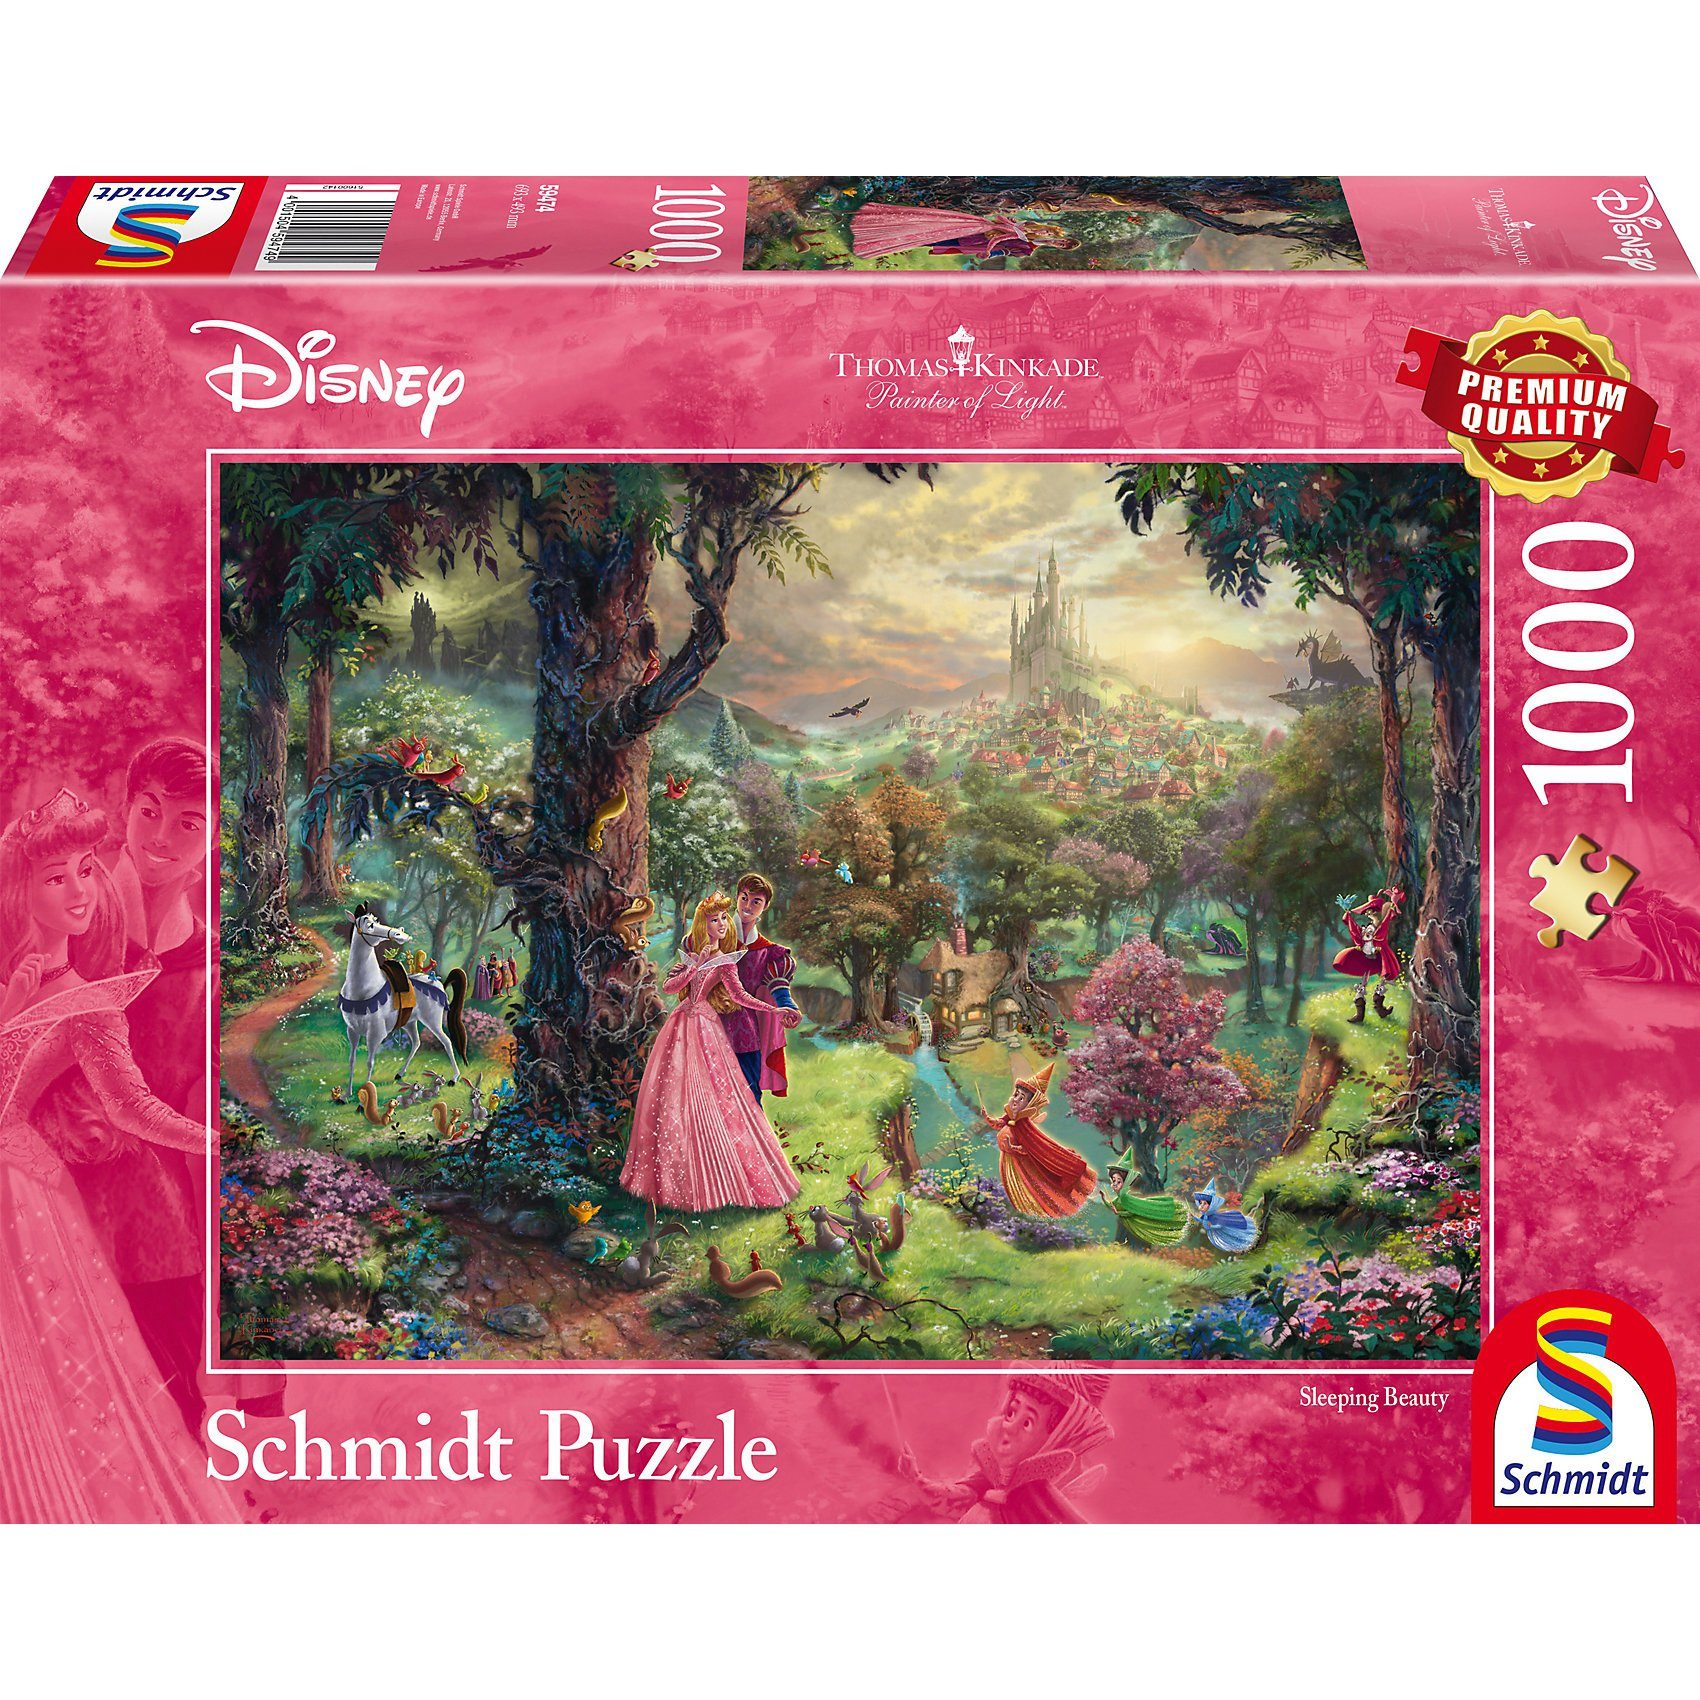 Schmidt Spiele Puzzle 1000 Teile Thomas Kinkade Disney Dornröschen